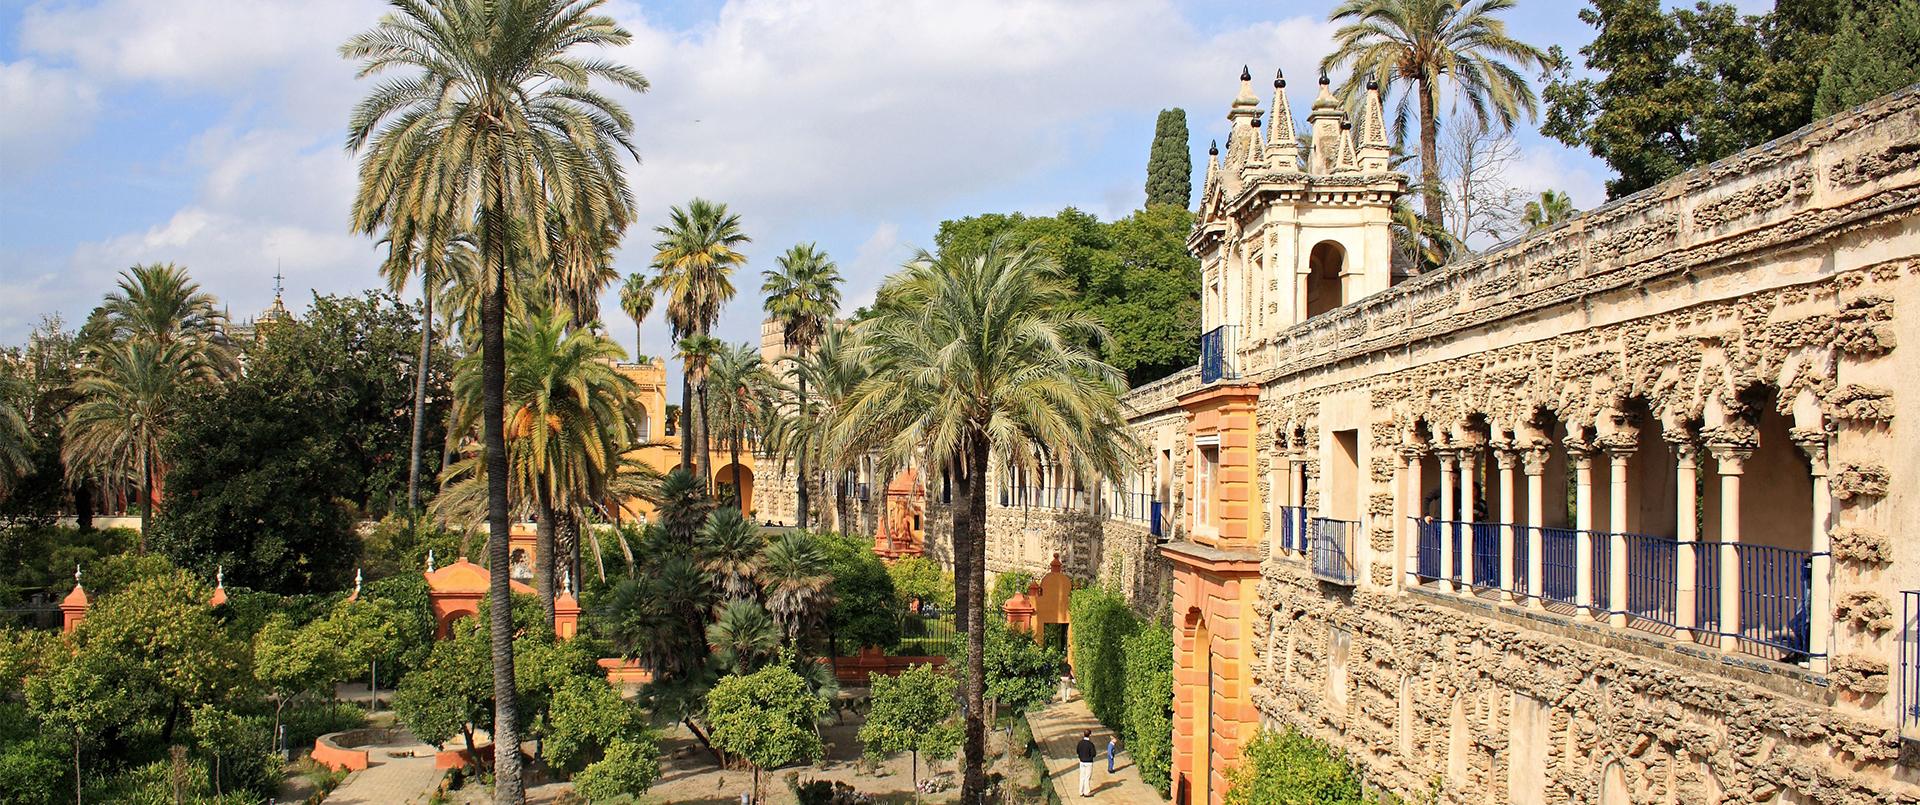 Exploring Andalusia: Jerez, Seville & Cadiz